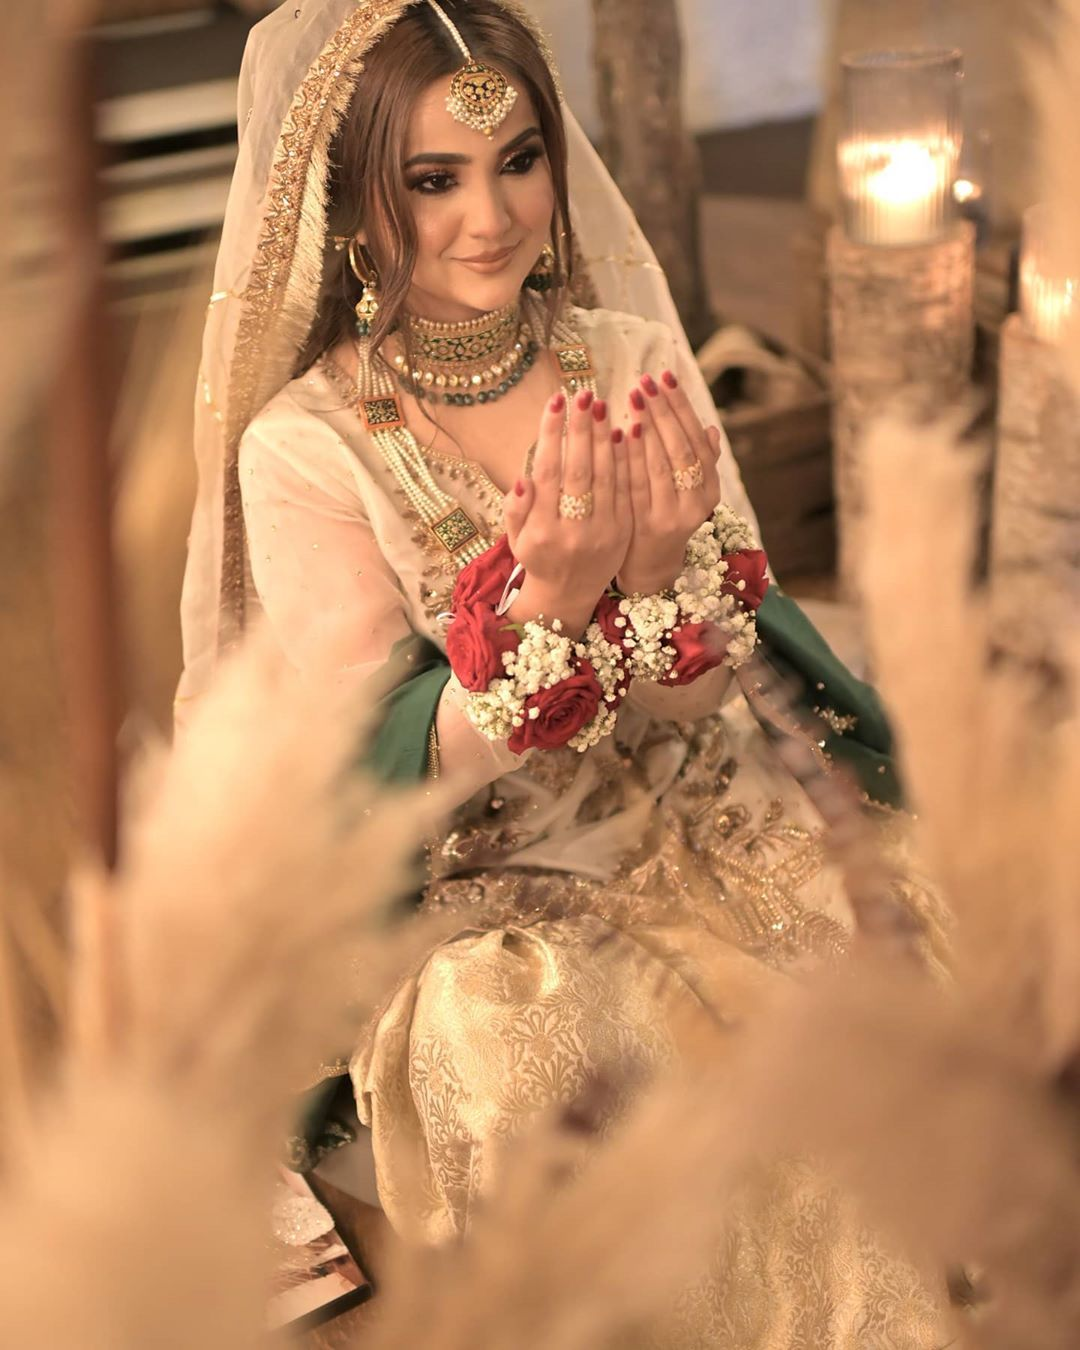 Girls bradford pakistani BBC NEWS